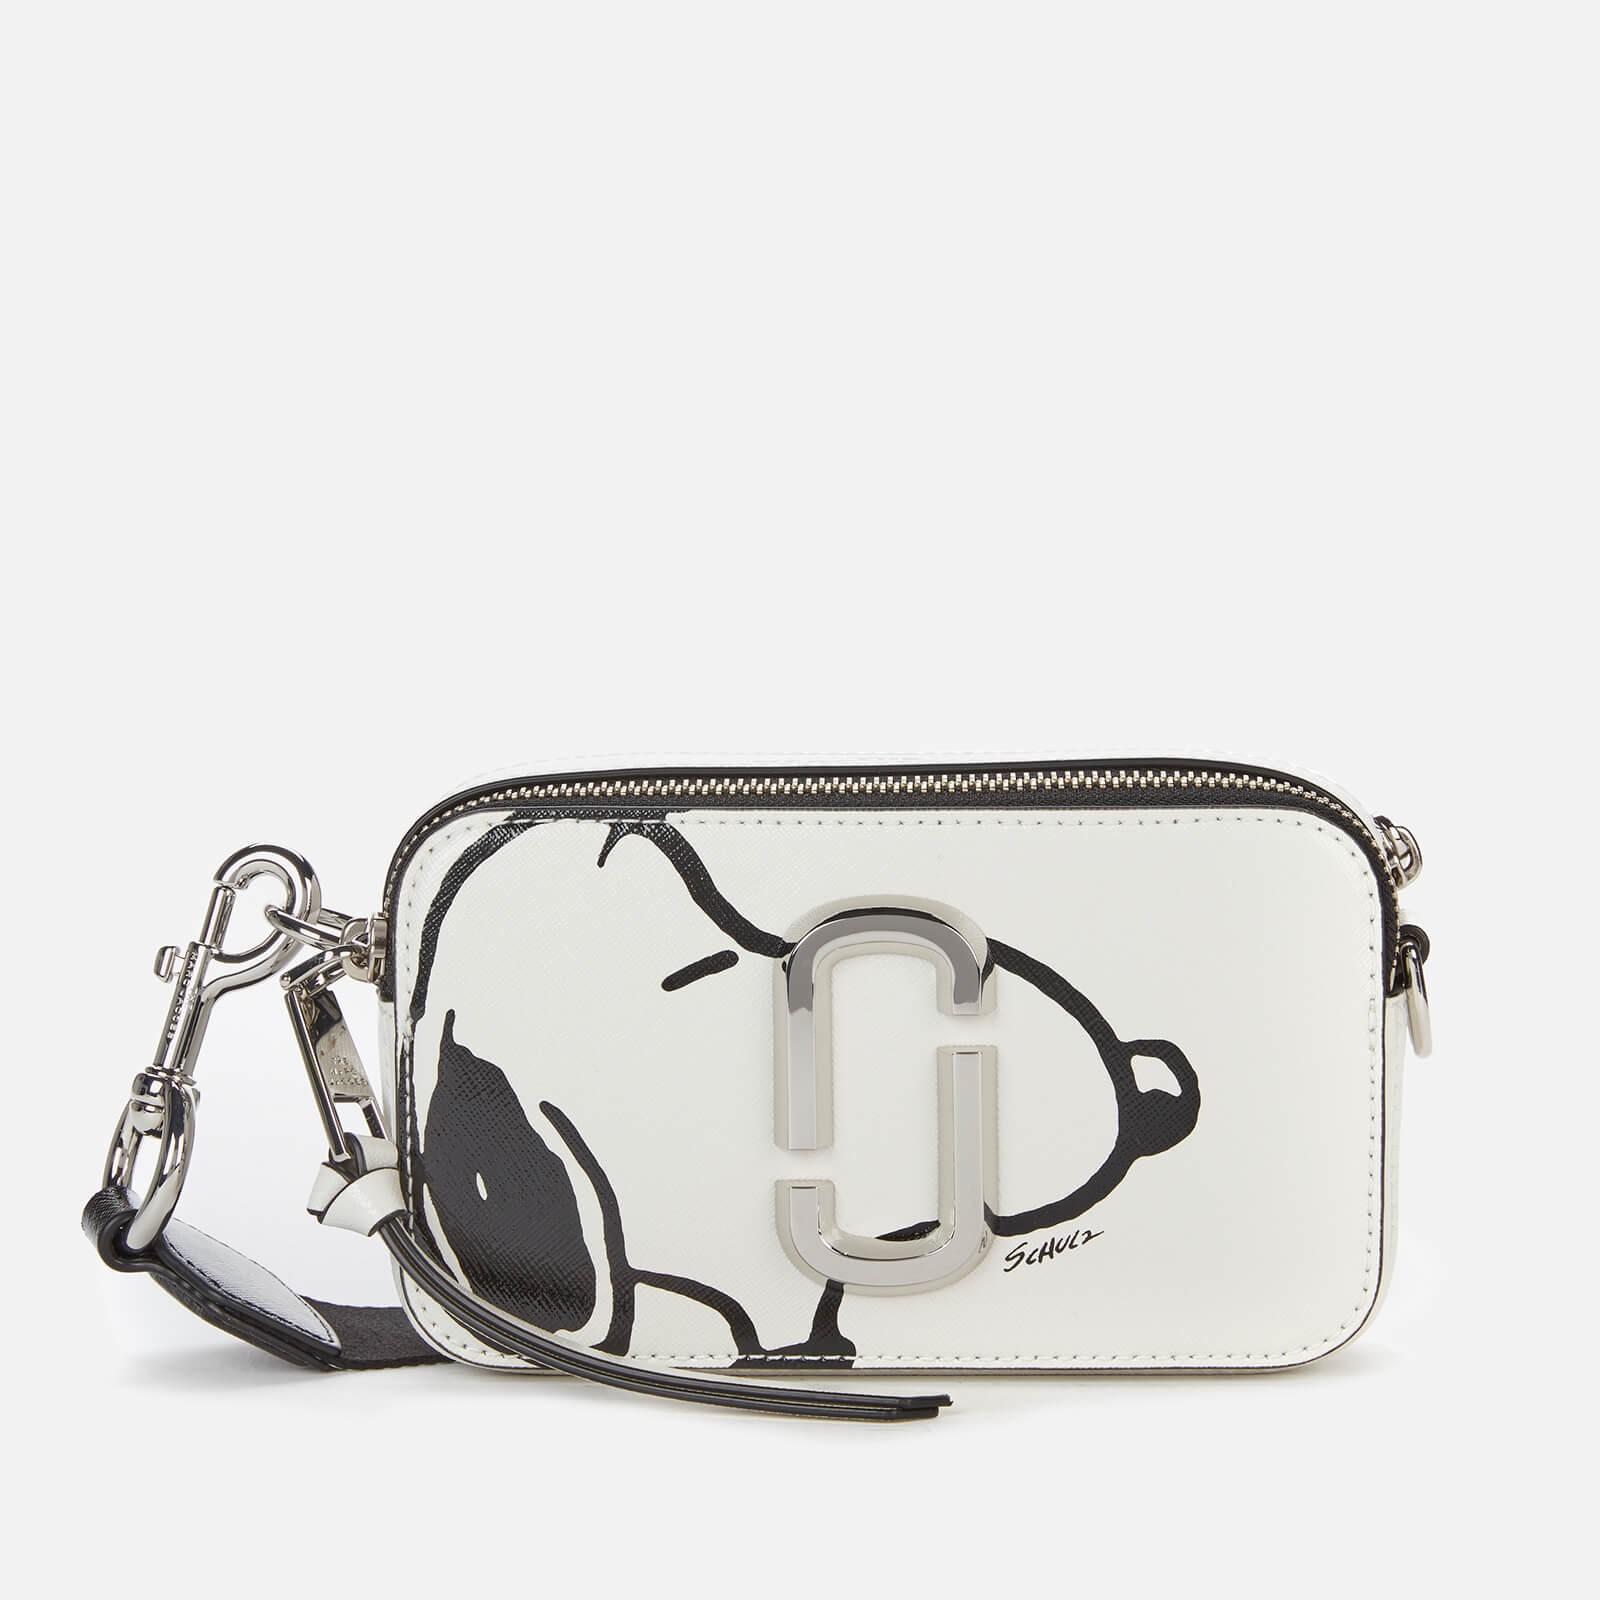 Marc Jacobs 史努比相机包